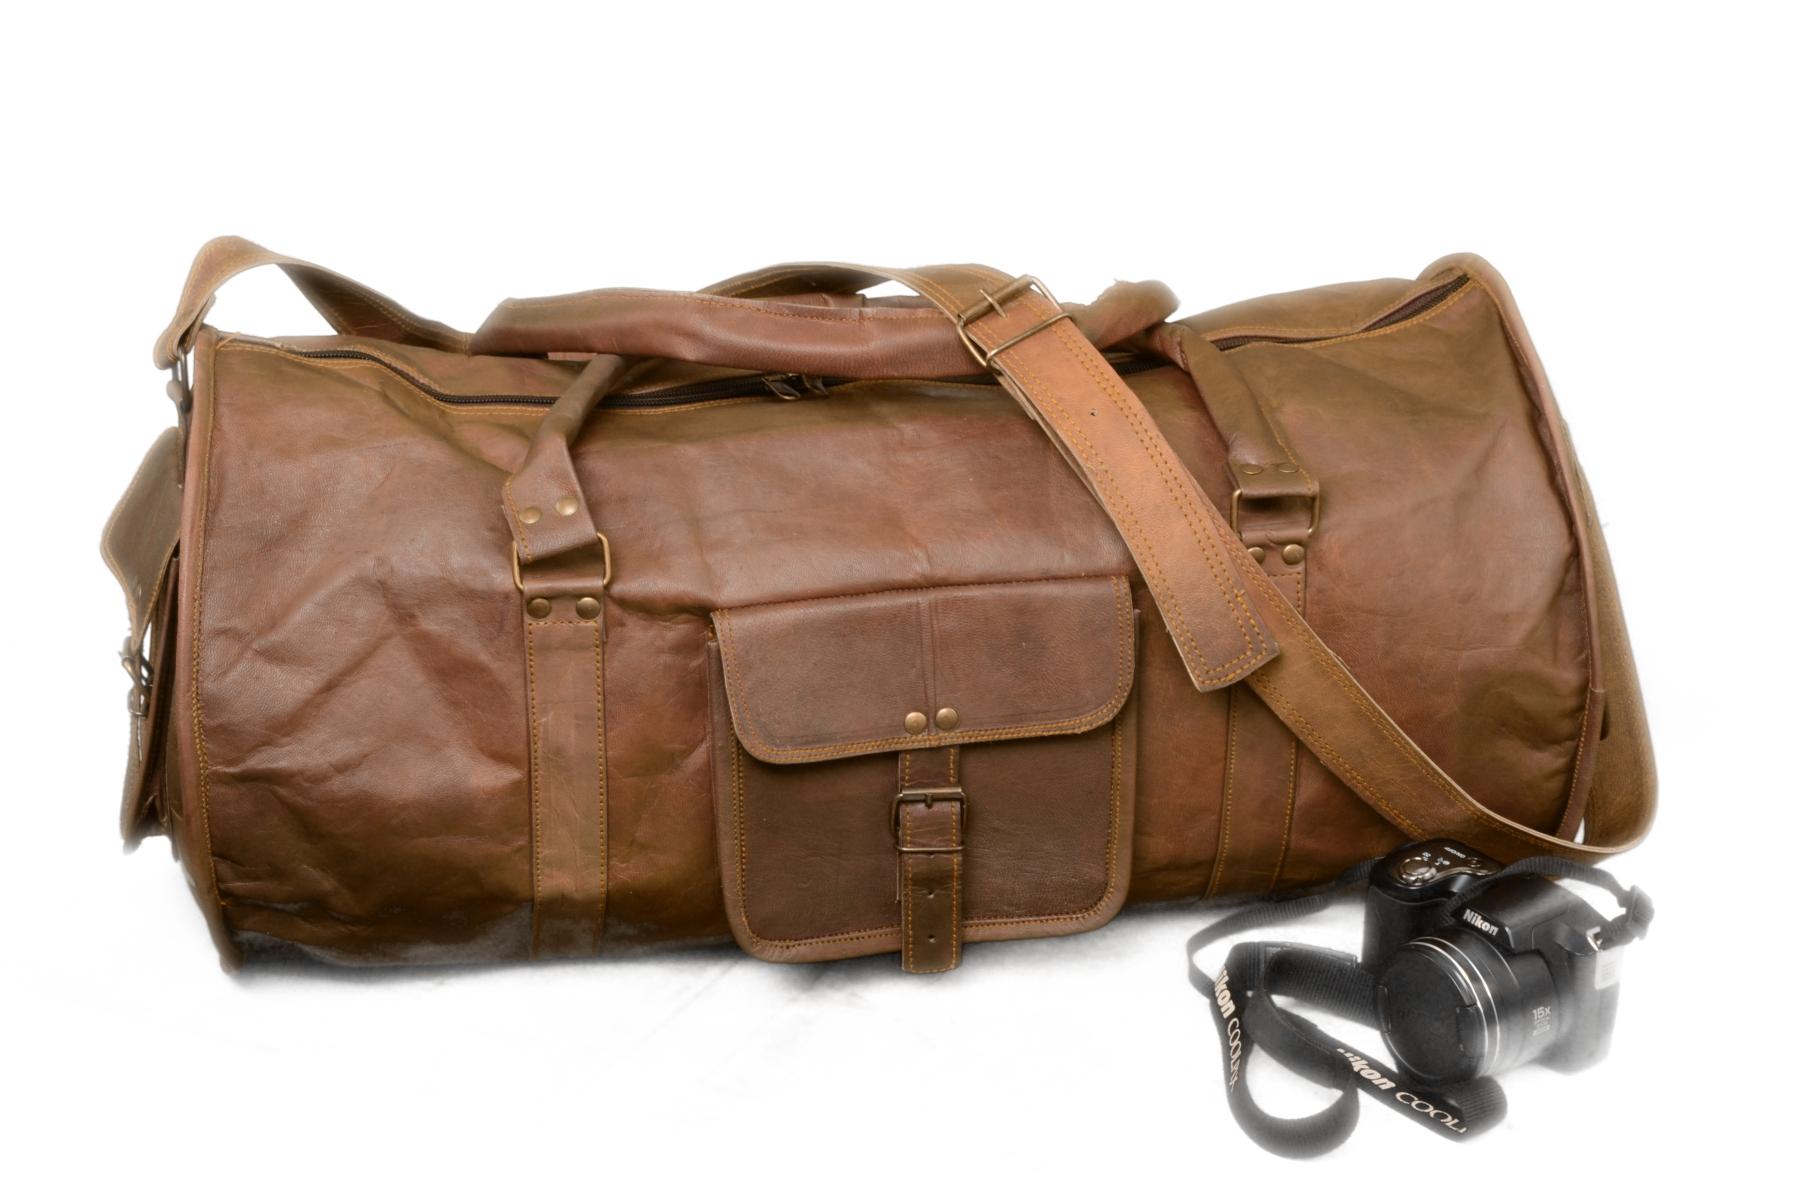 b5f94cb61e 24 Inch Goat Leather Handmade Vintage Travel Luggage Duffel Gym Overnight  Bag